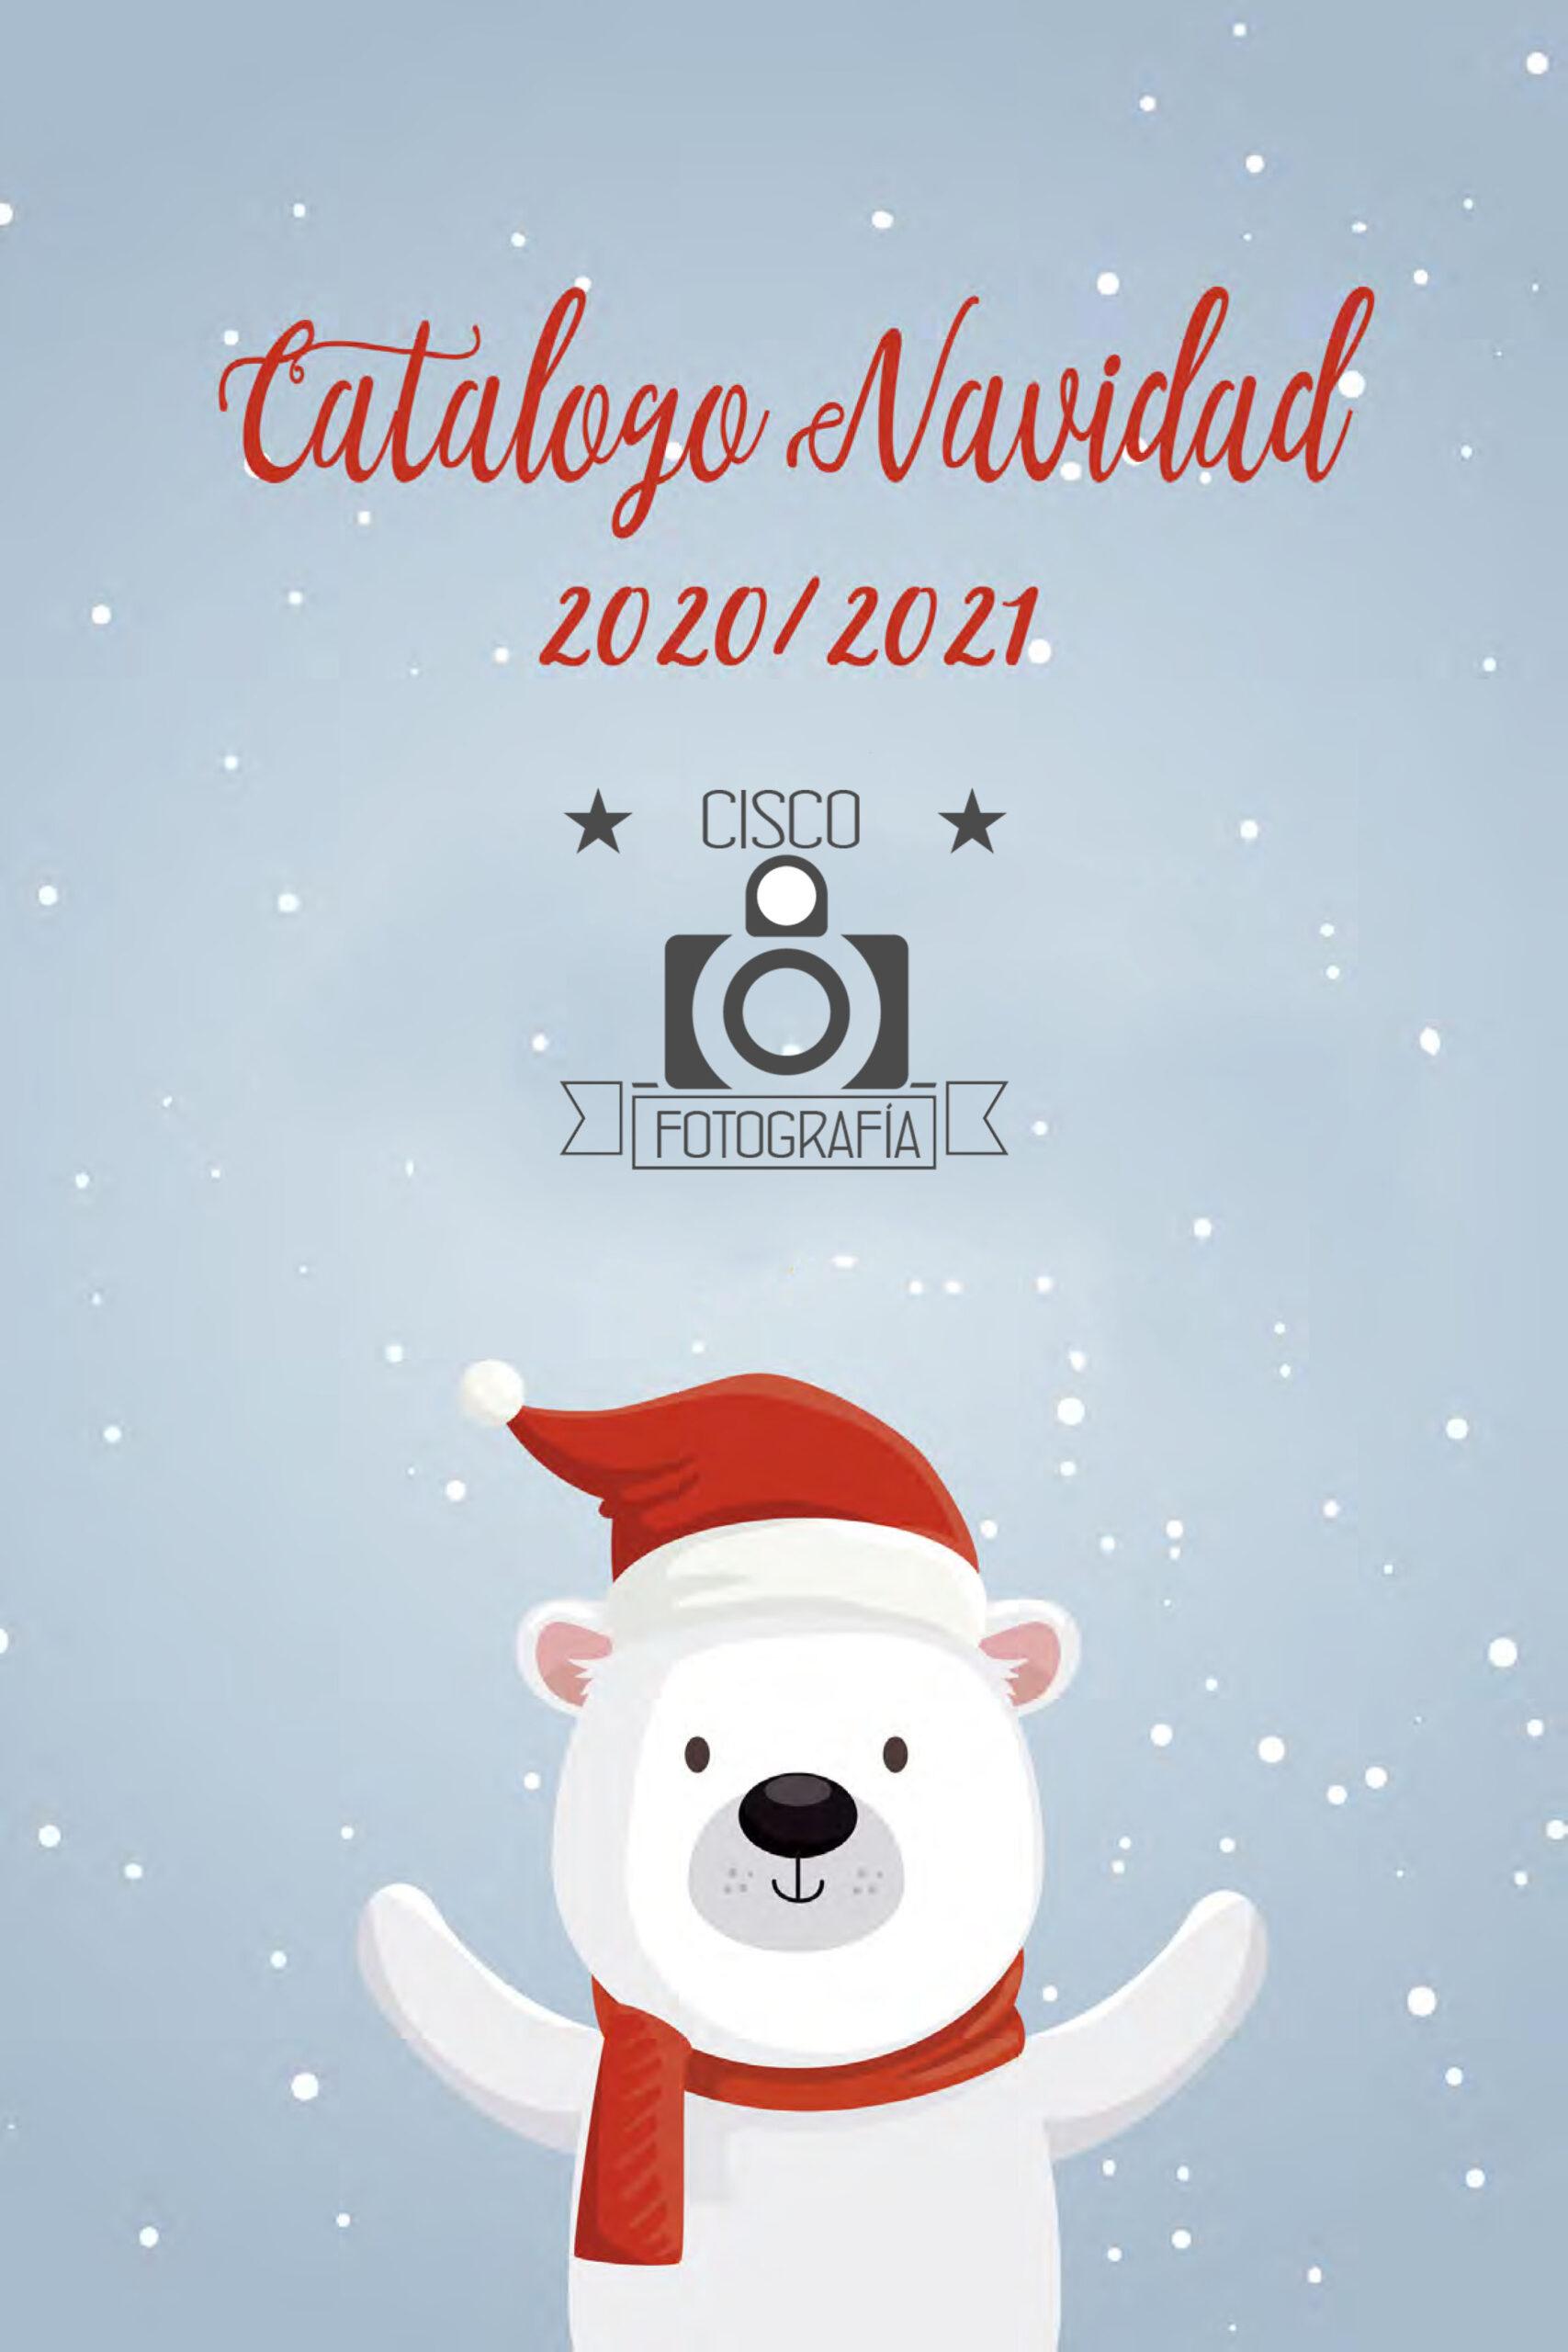 CATALOGO NAVIDAD 2020 CISCO-1